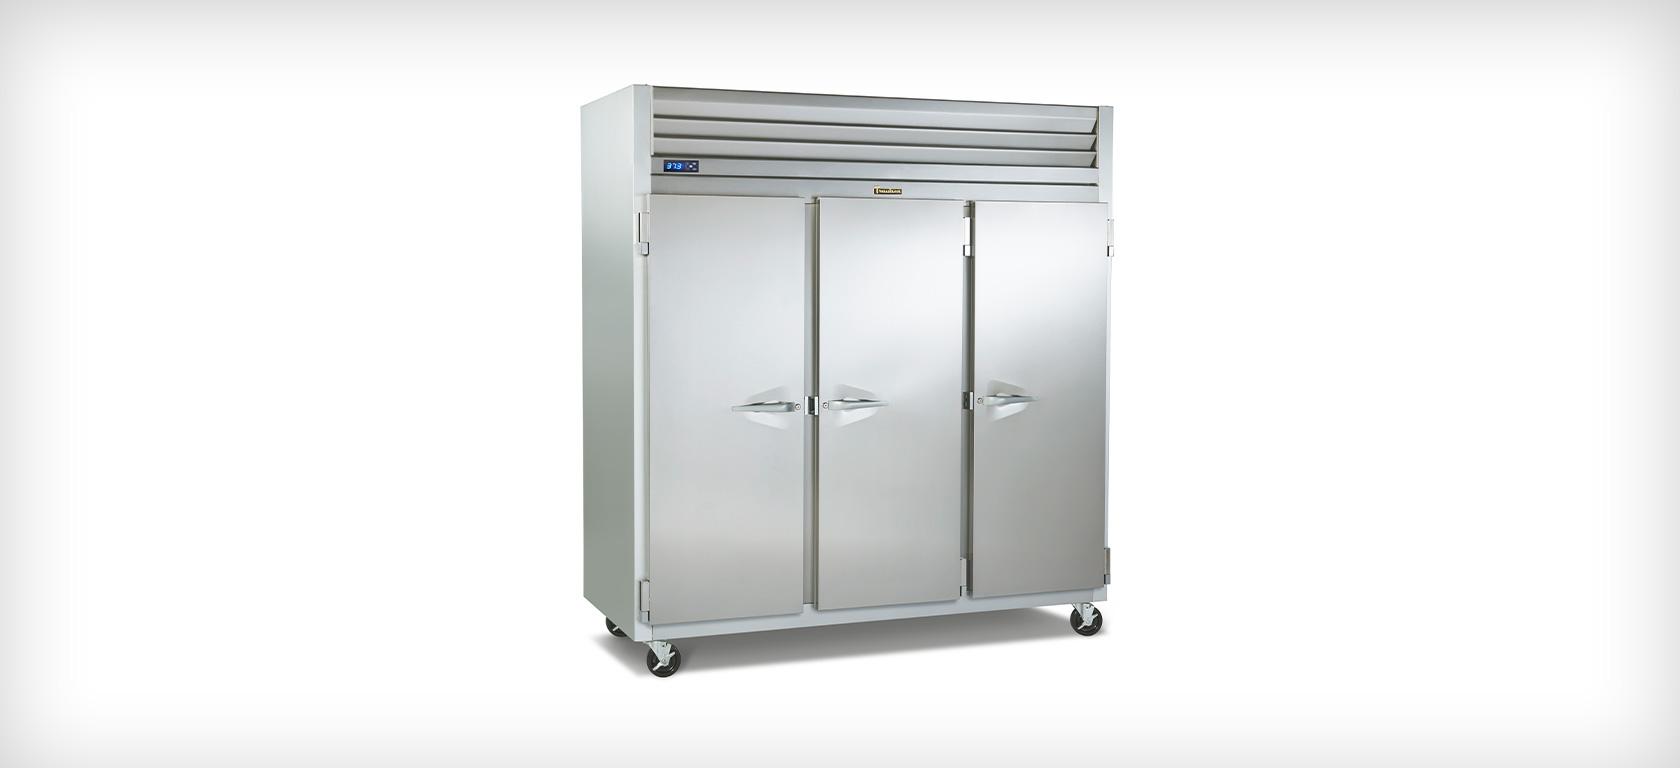 Reach-In Refrigerator Model G30010